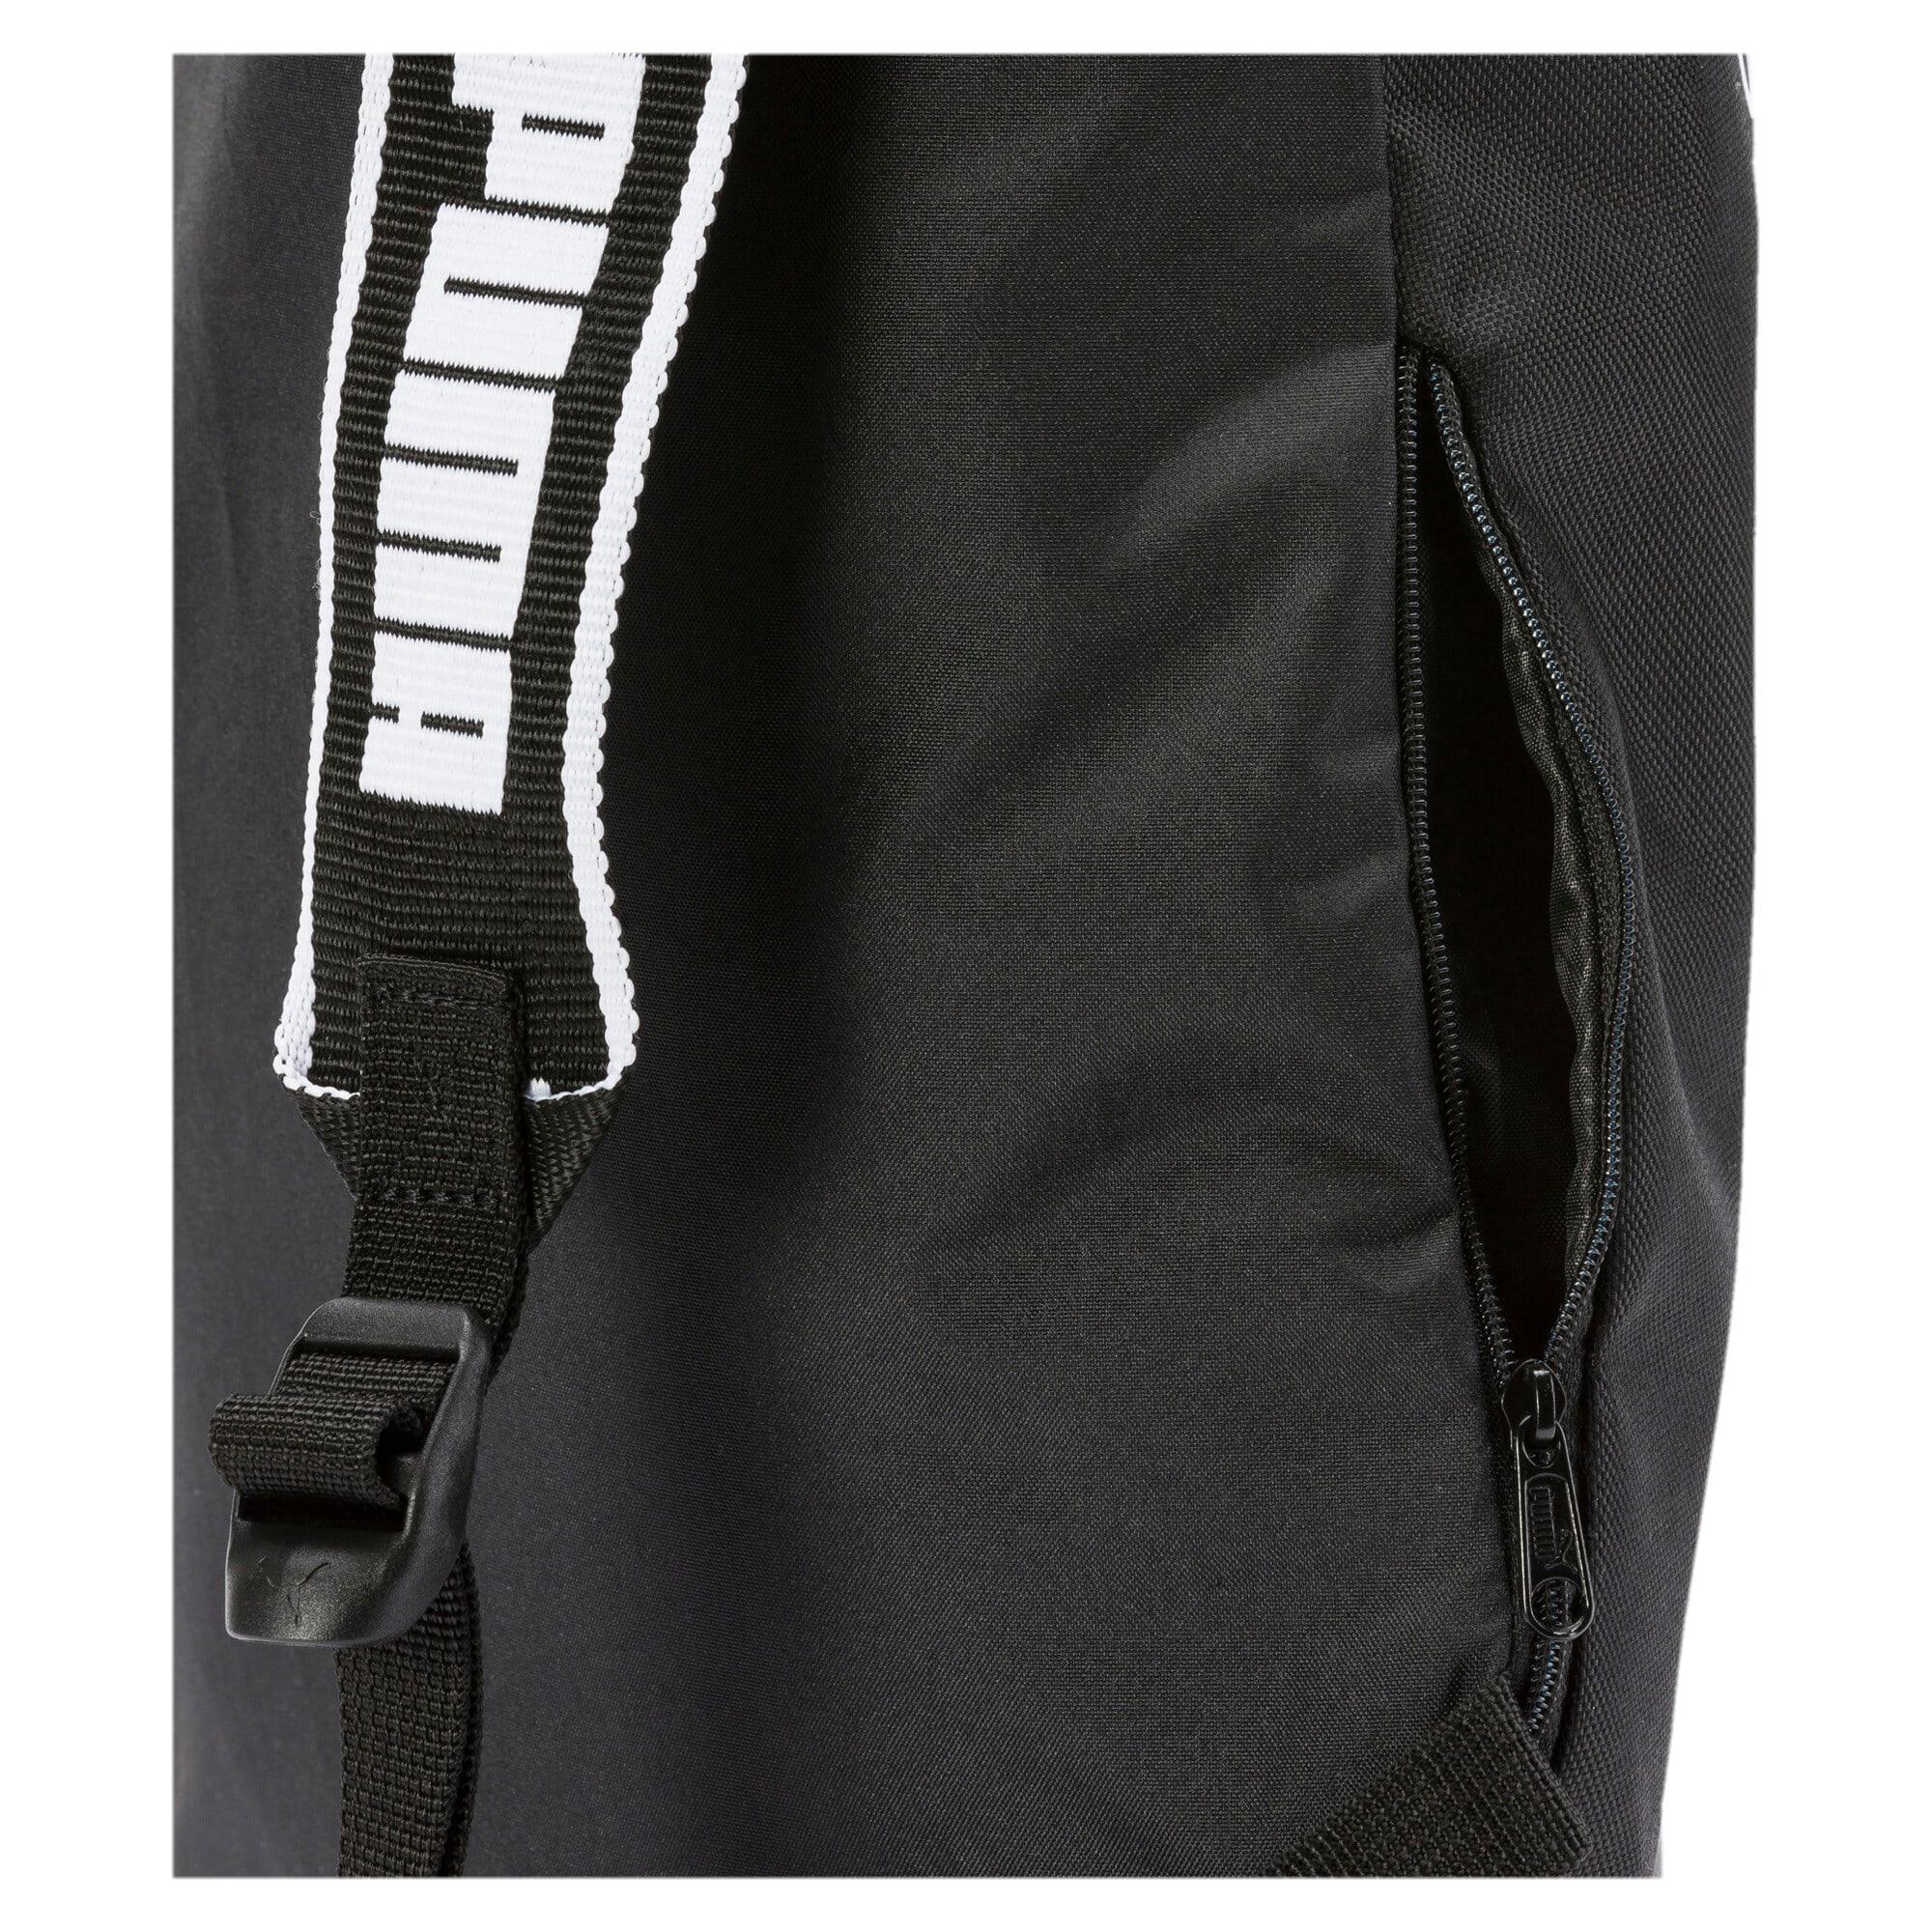 Thumbnail 3 of Sole Smart Bag, Puma Black, medium-IND